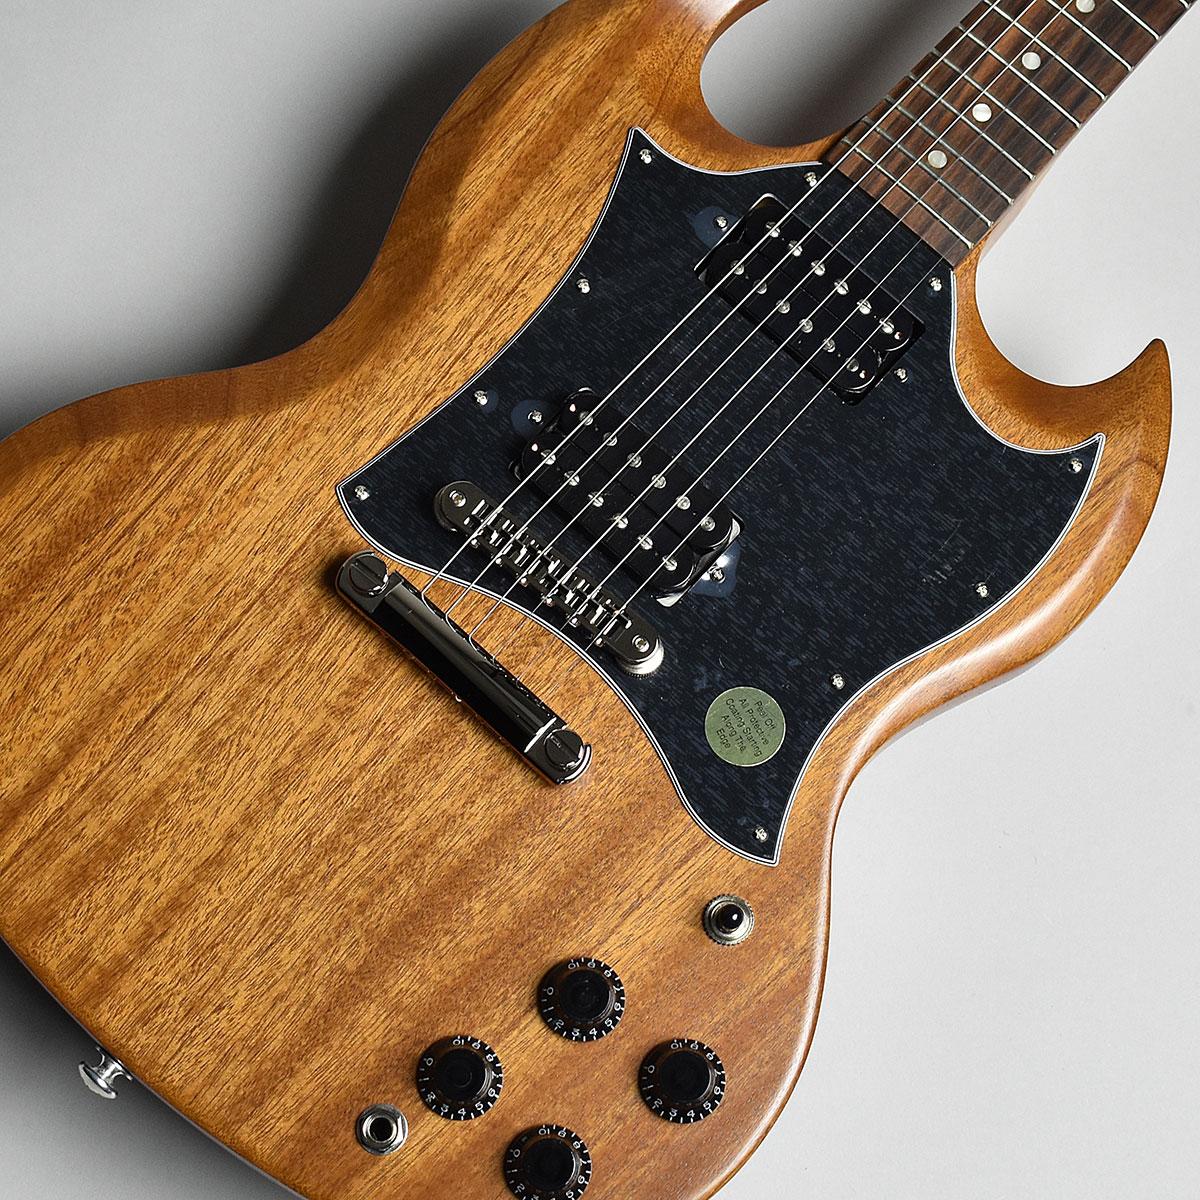 Gibson SG Standard Tribute 2019 Walnut Vintage Gloss S/N:190004411 【ギブソン】【未展示品】